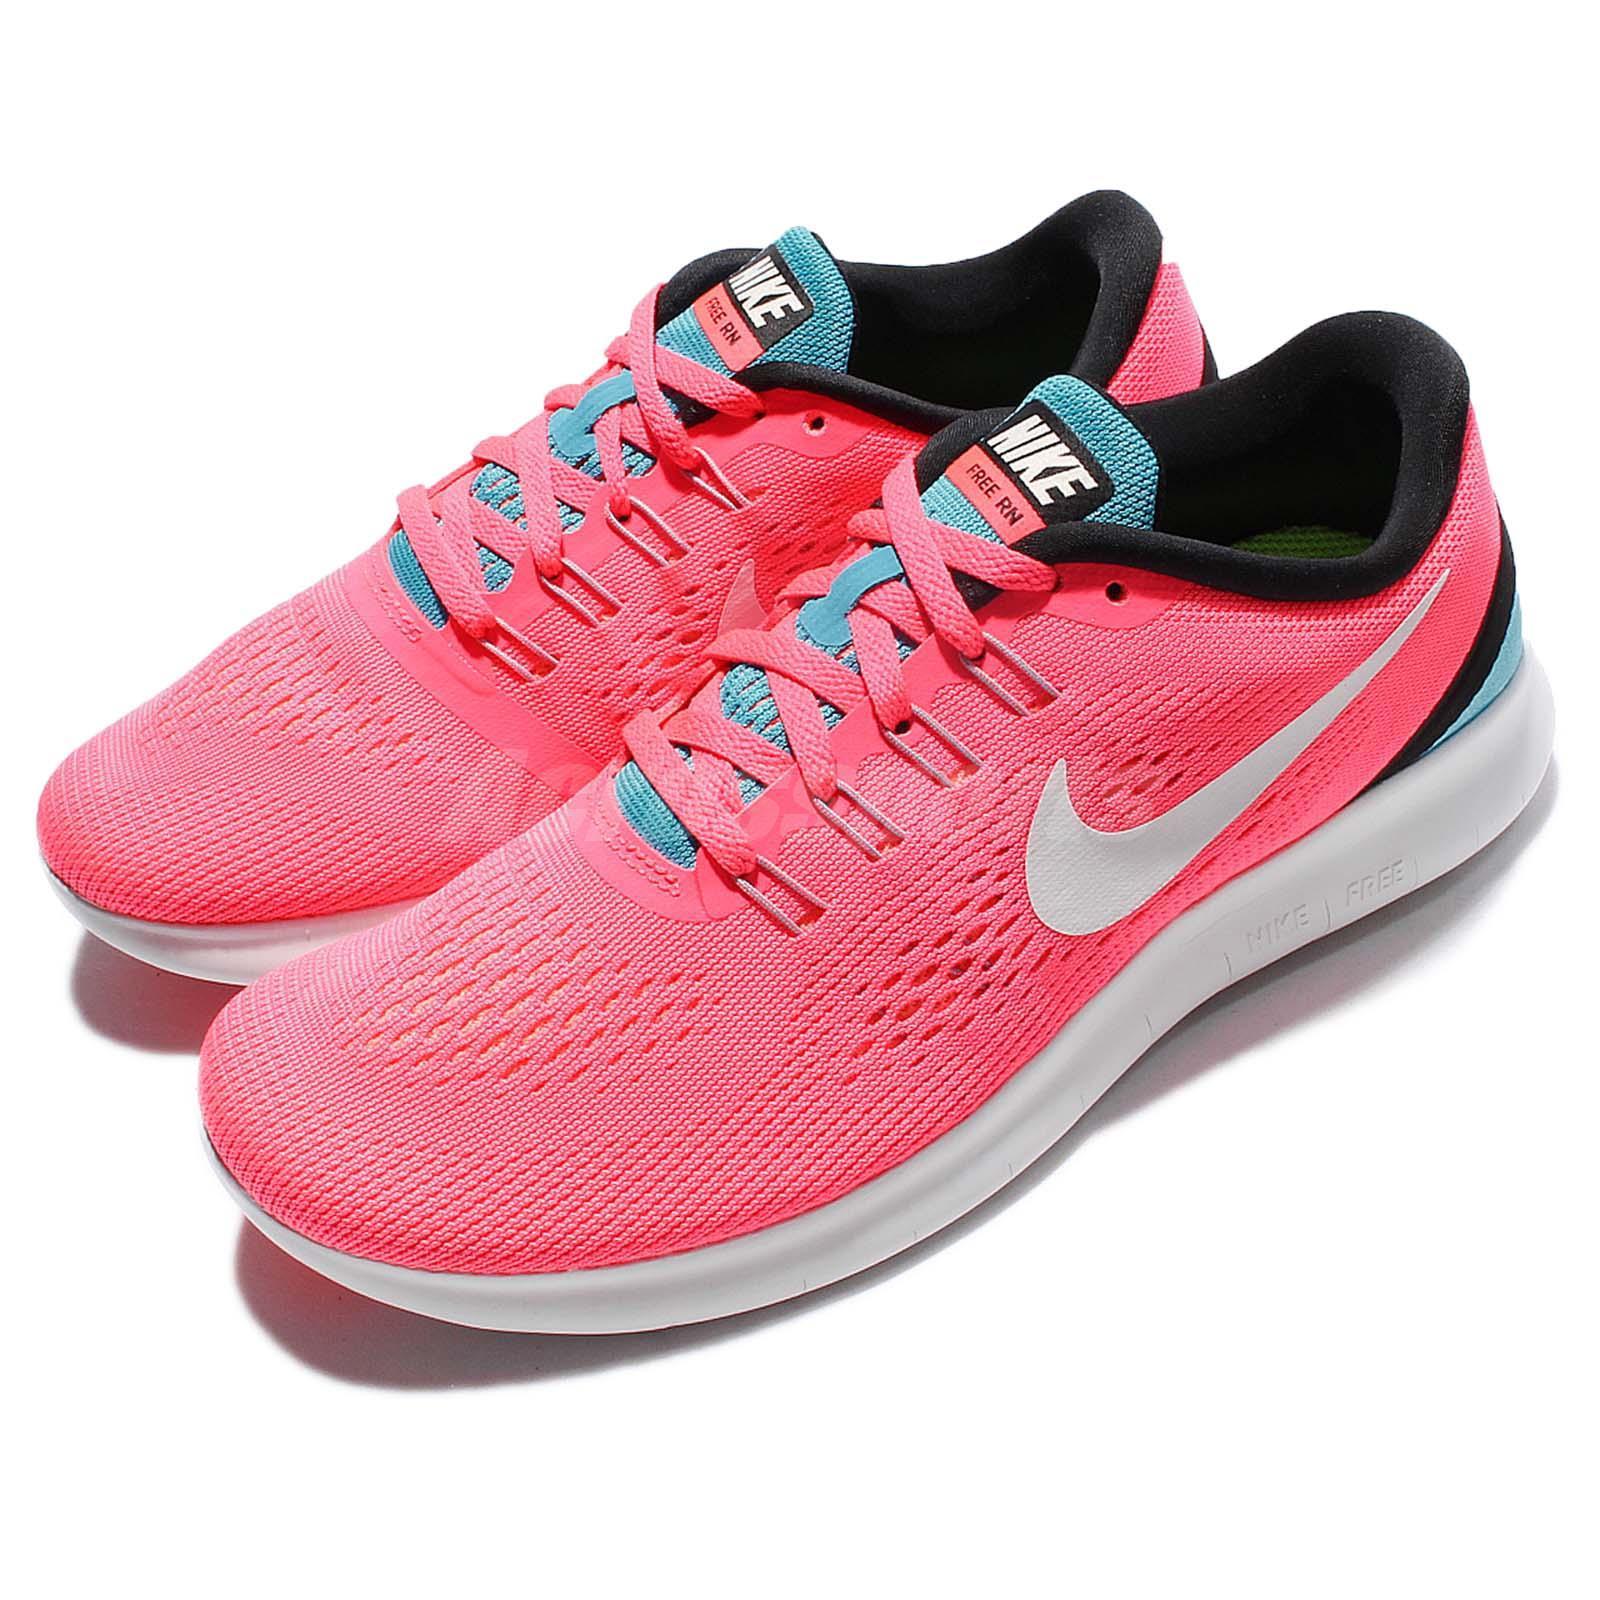 NIKE Womens Free RN Run Racer Pink Off White Blue 831509 602 Running